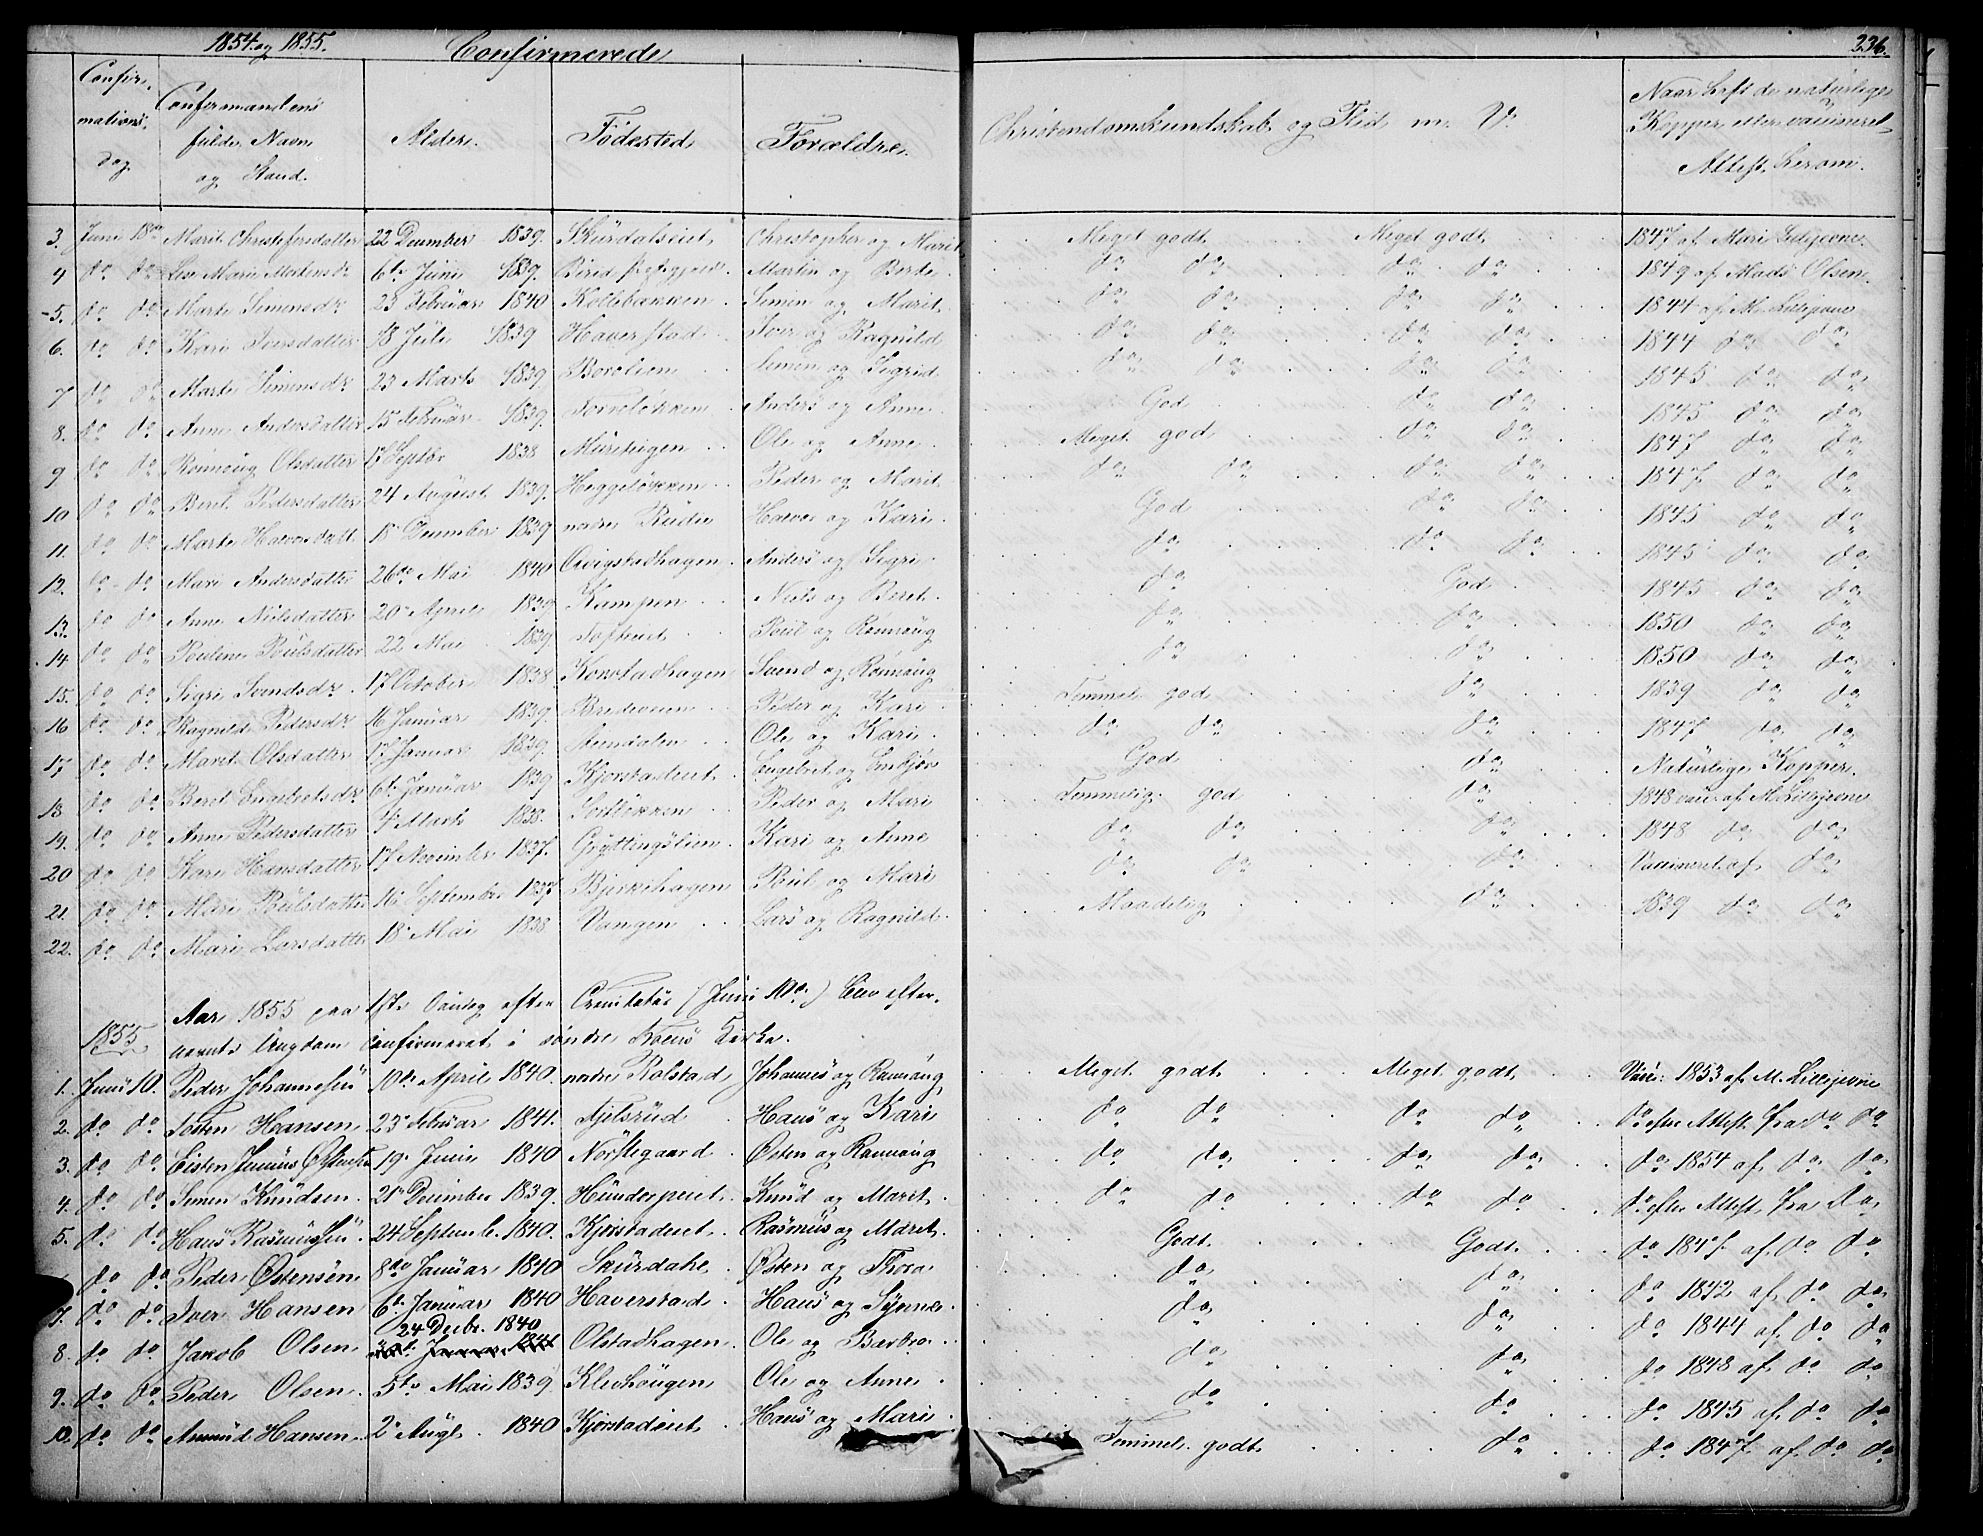 SAH, Sør-Fron prestekontor, H/Ha/Hab/L0001: Klokkerbok nr. 1, 1844-1863, s. 236